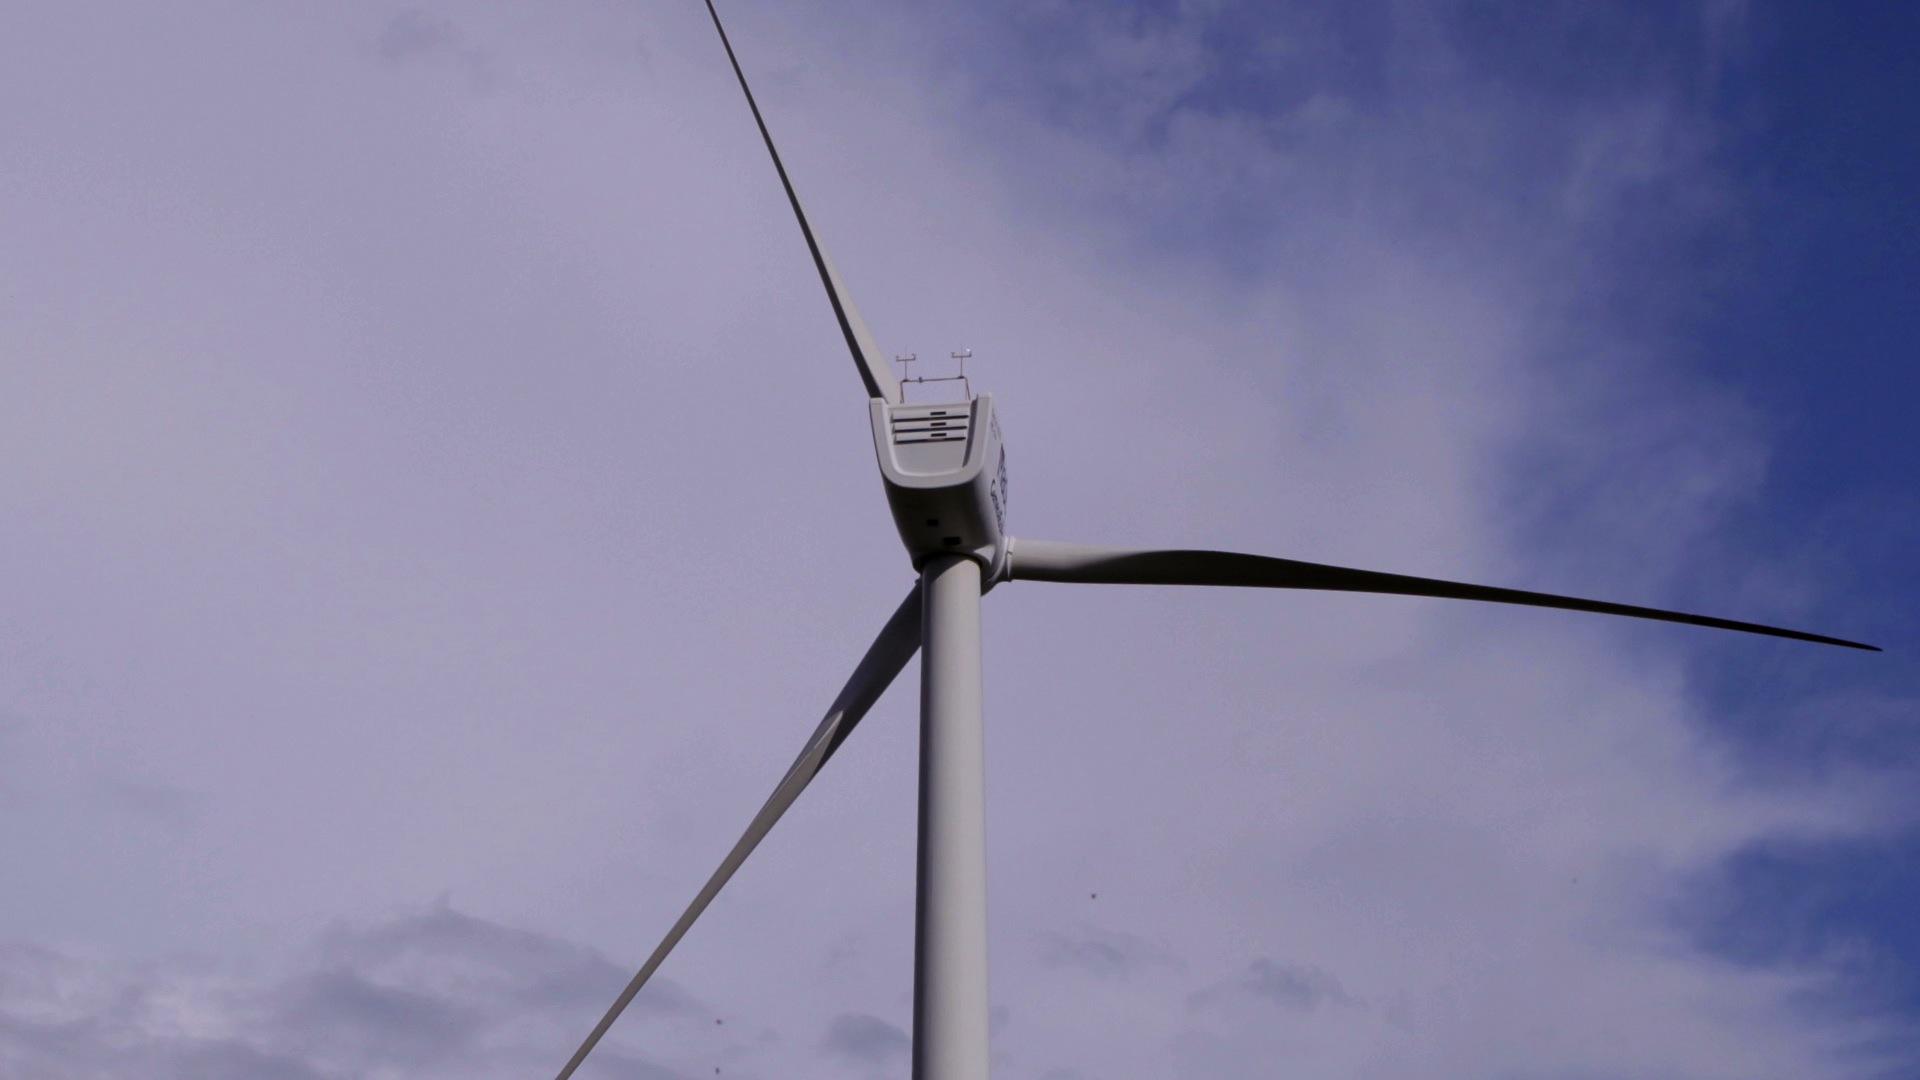 wind_power20-8262013